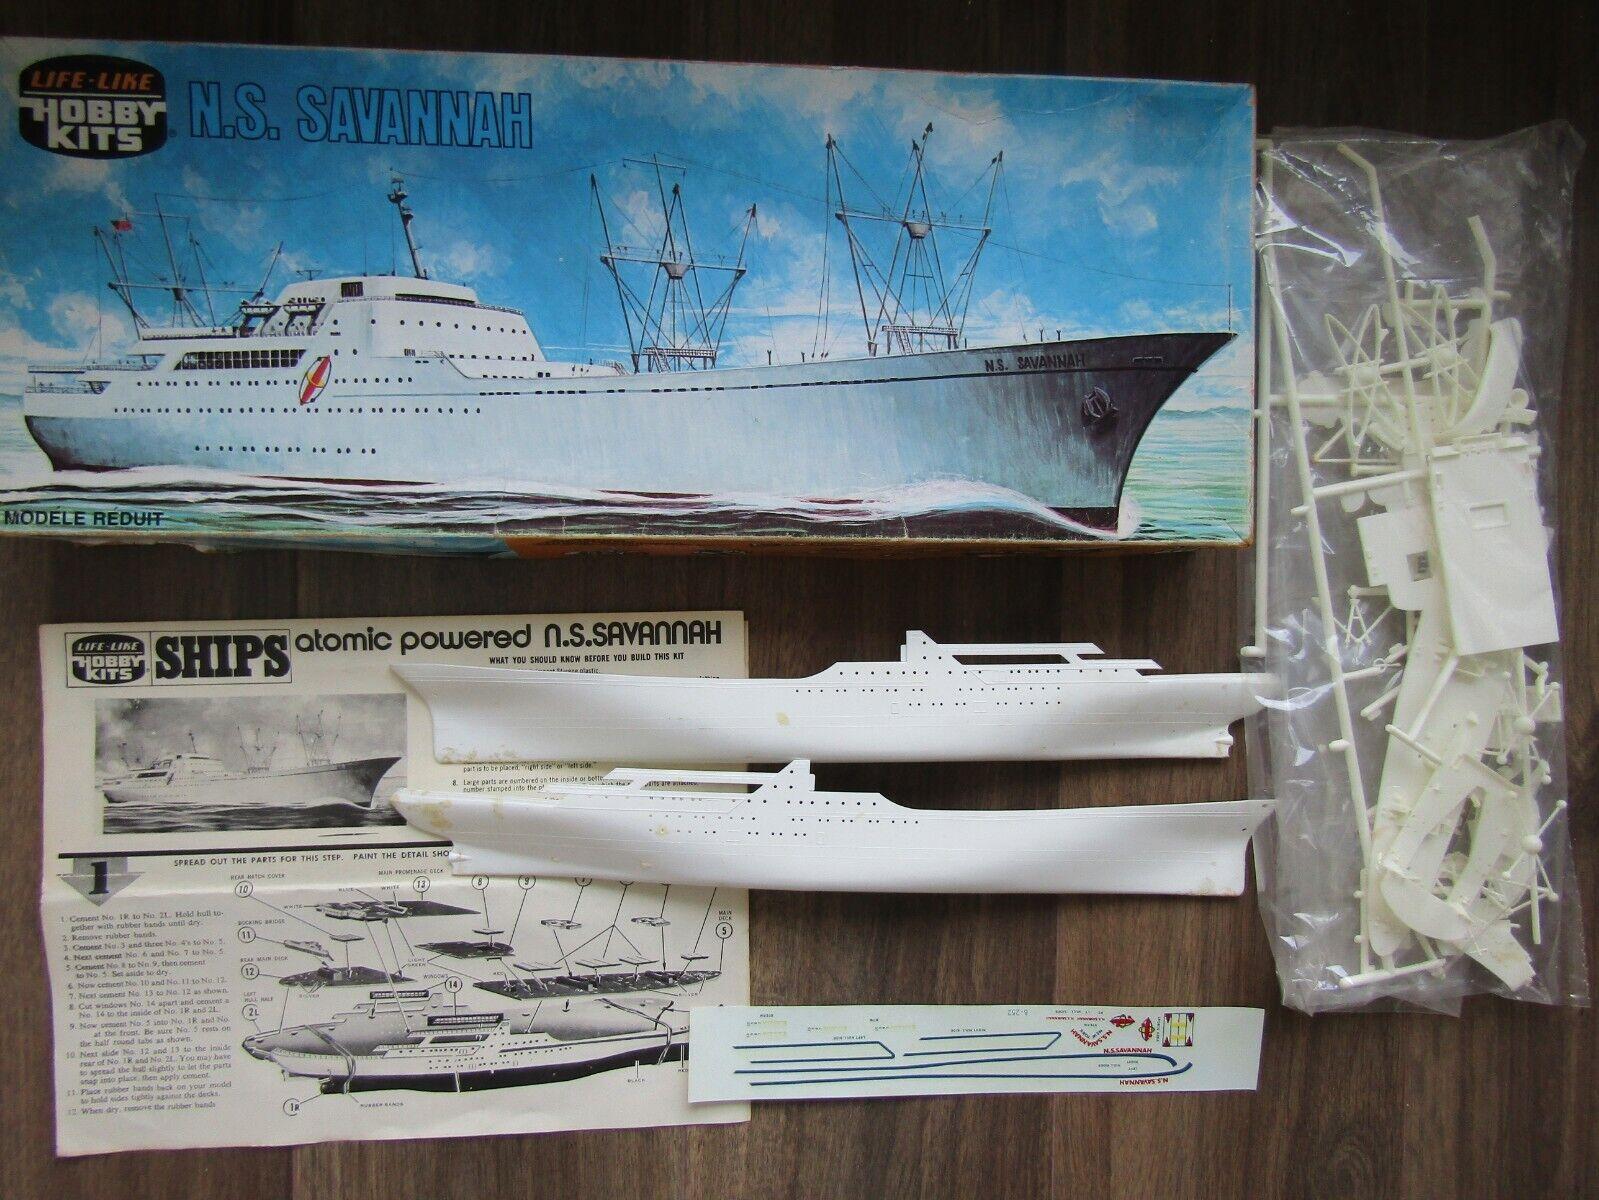 HS SAVANNA MERCHANT SHIP  FIRST NUCLEAR POWERED 1960  LIFE-LIKE 1 400